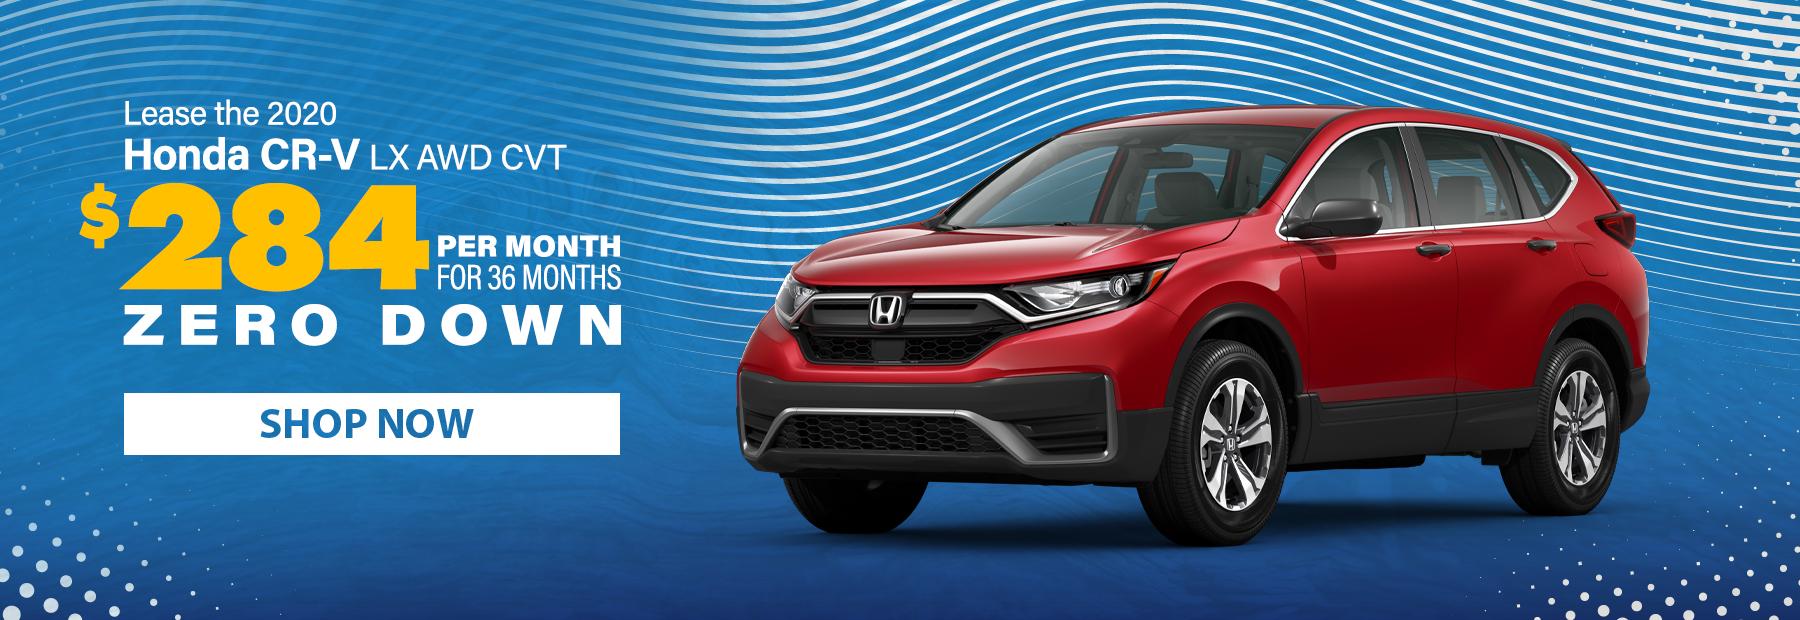 Lease a 2020 Honda CR-V LX AWD CVT SUV